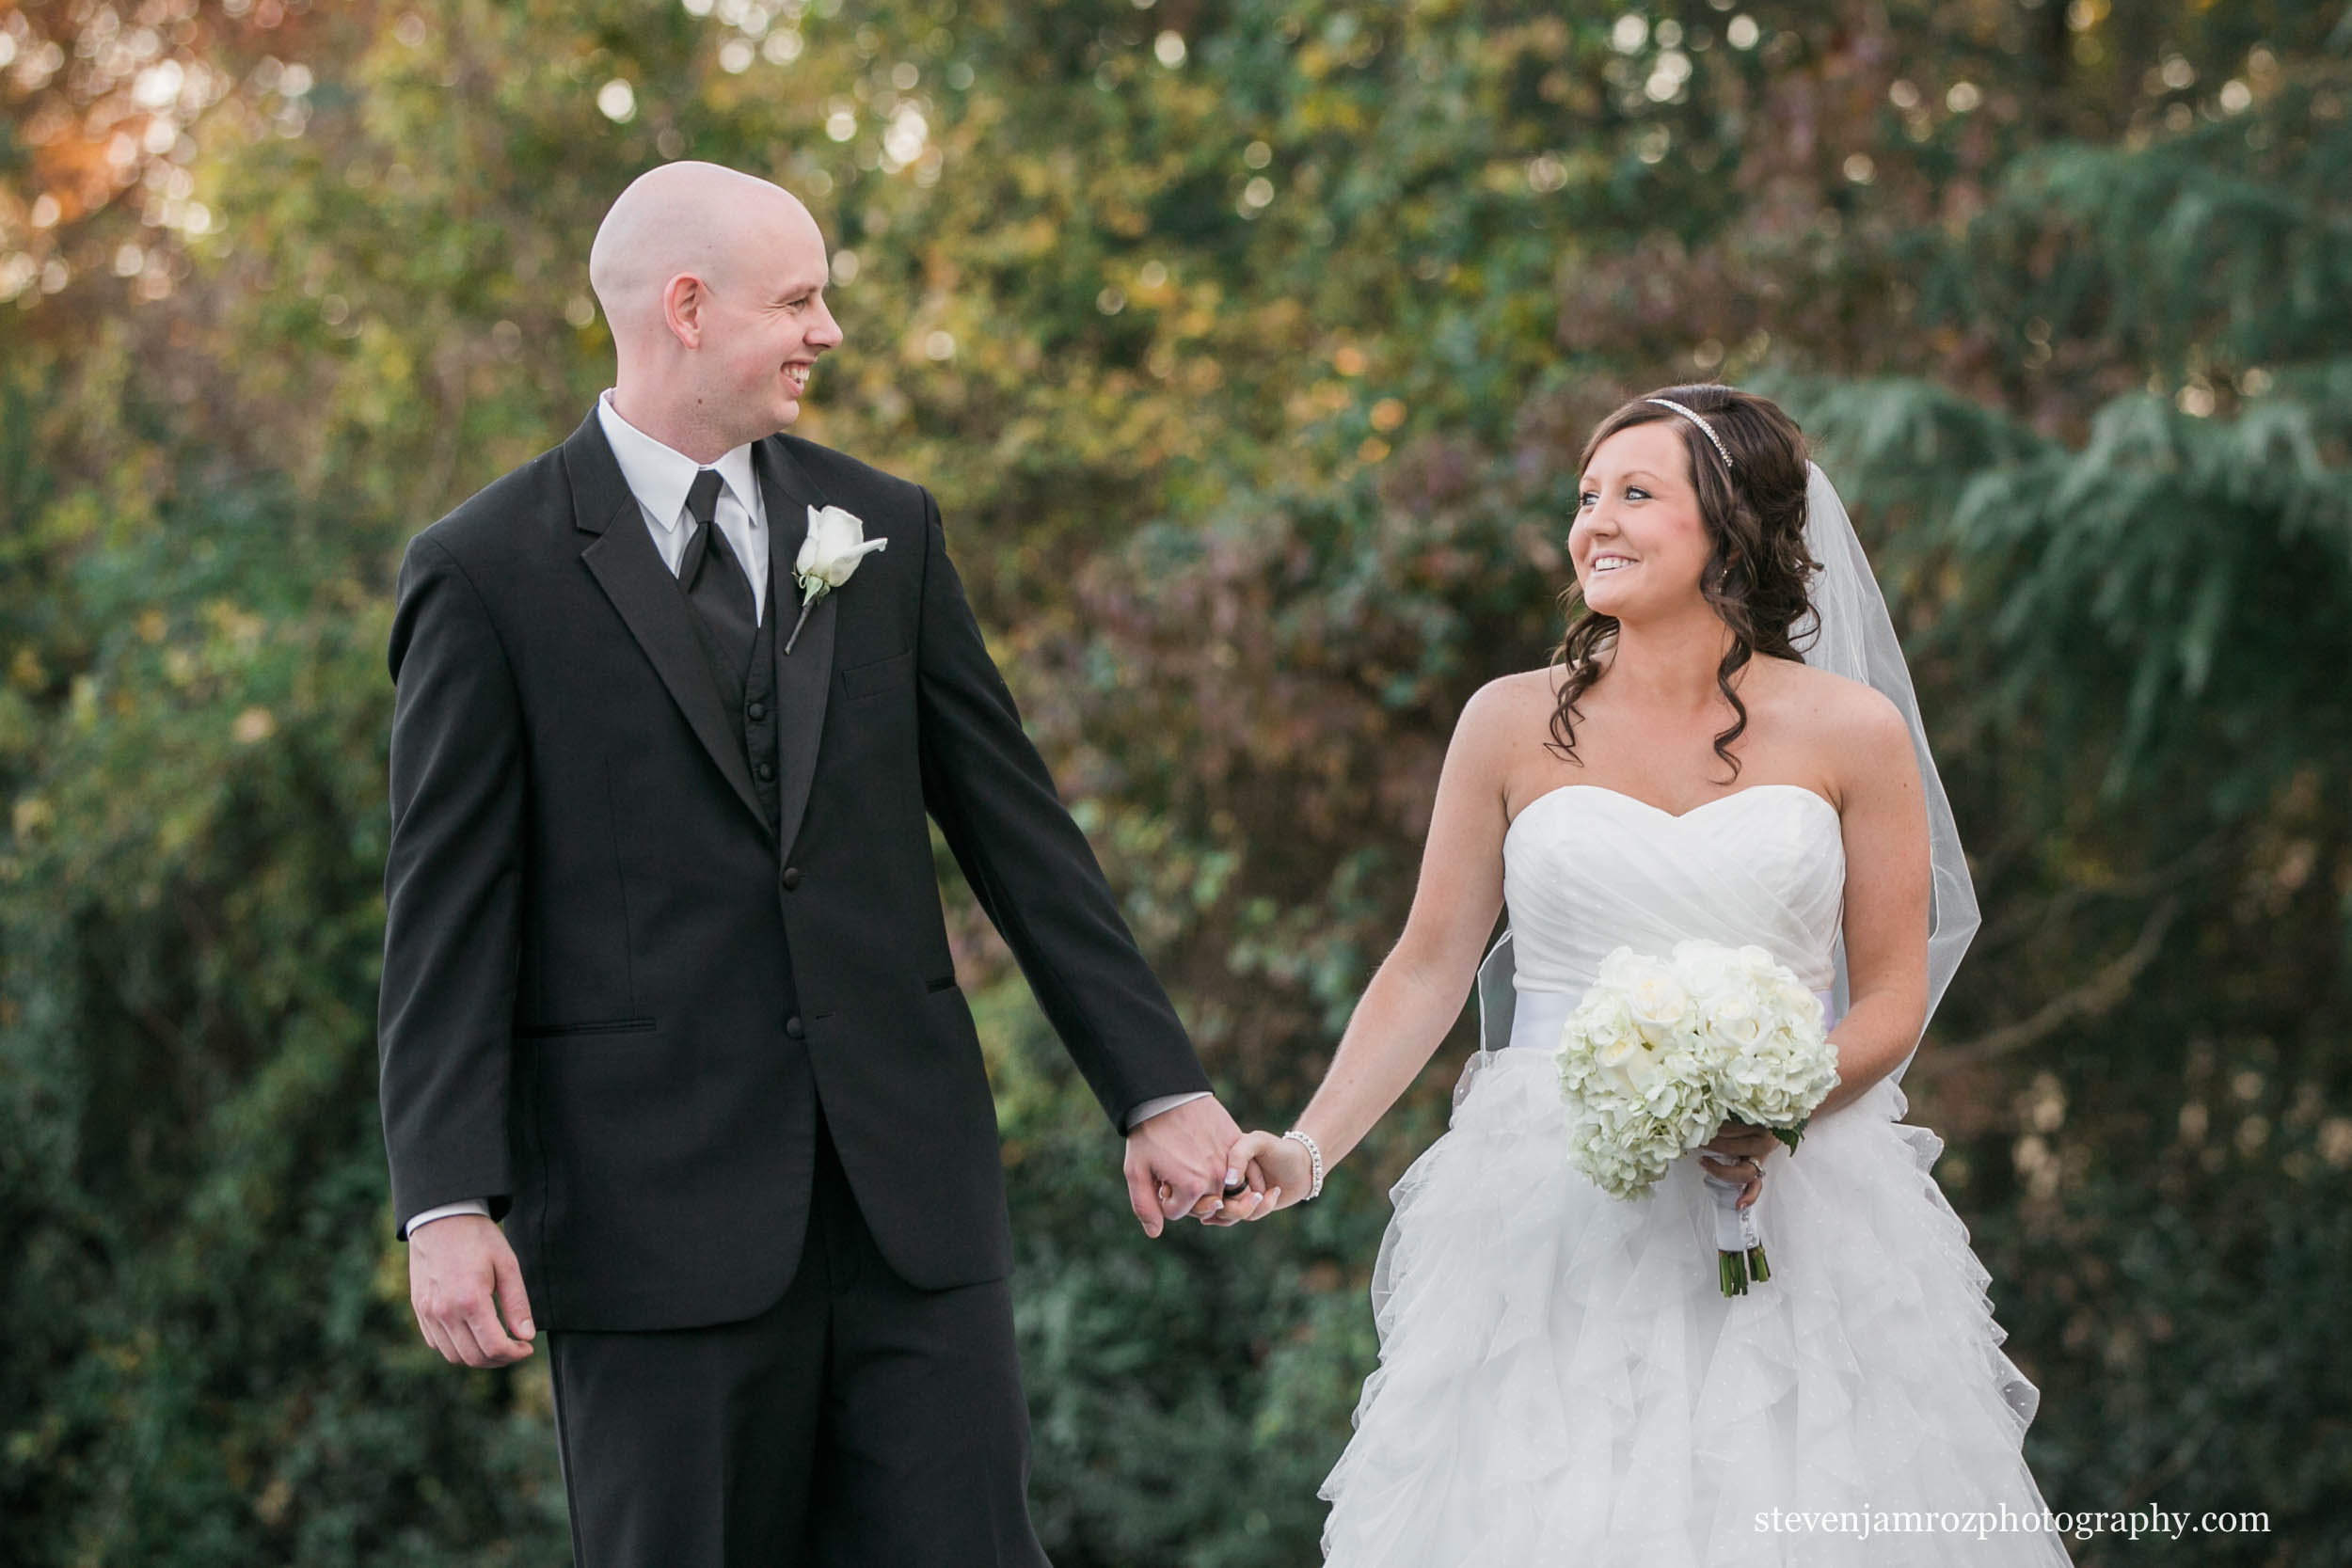 just-married-raleigh-nc-steven-jamroz-photography-0144.jpg